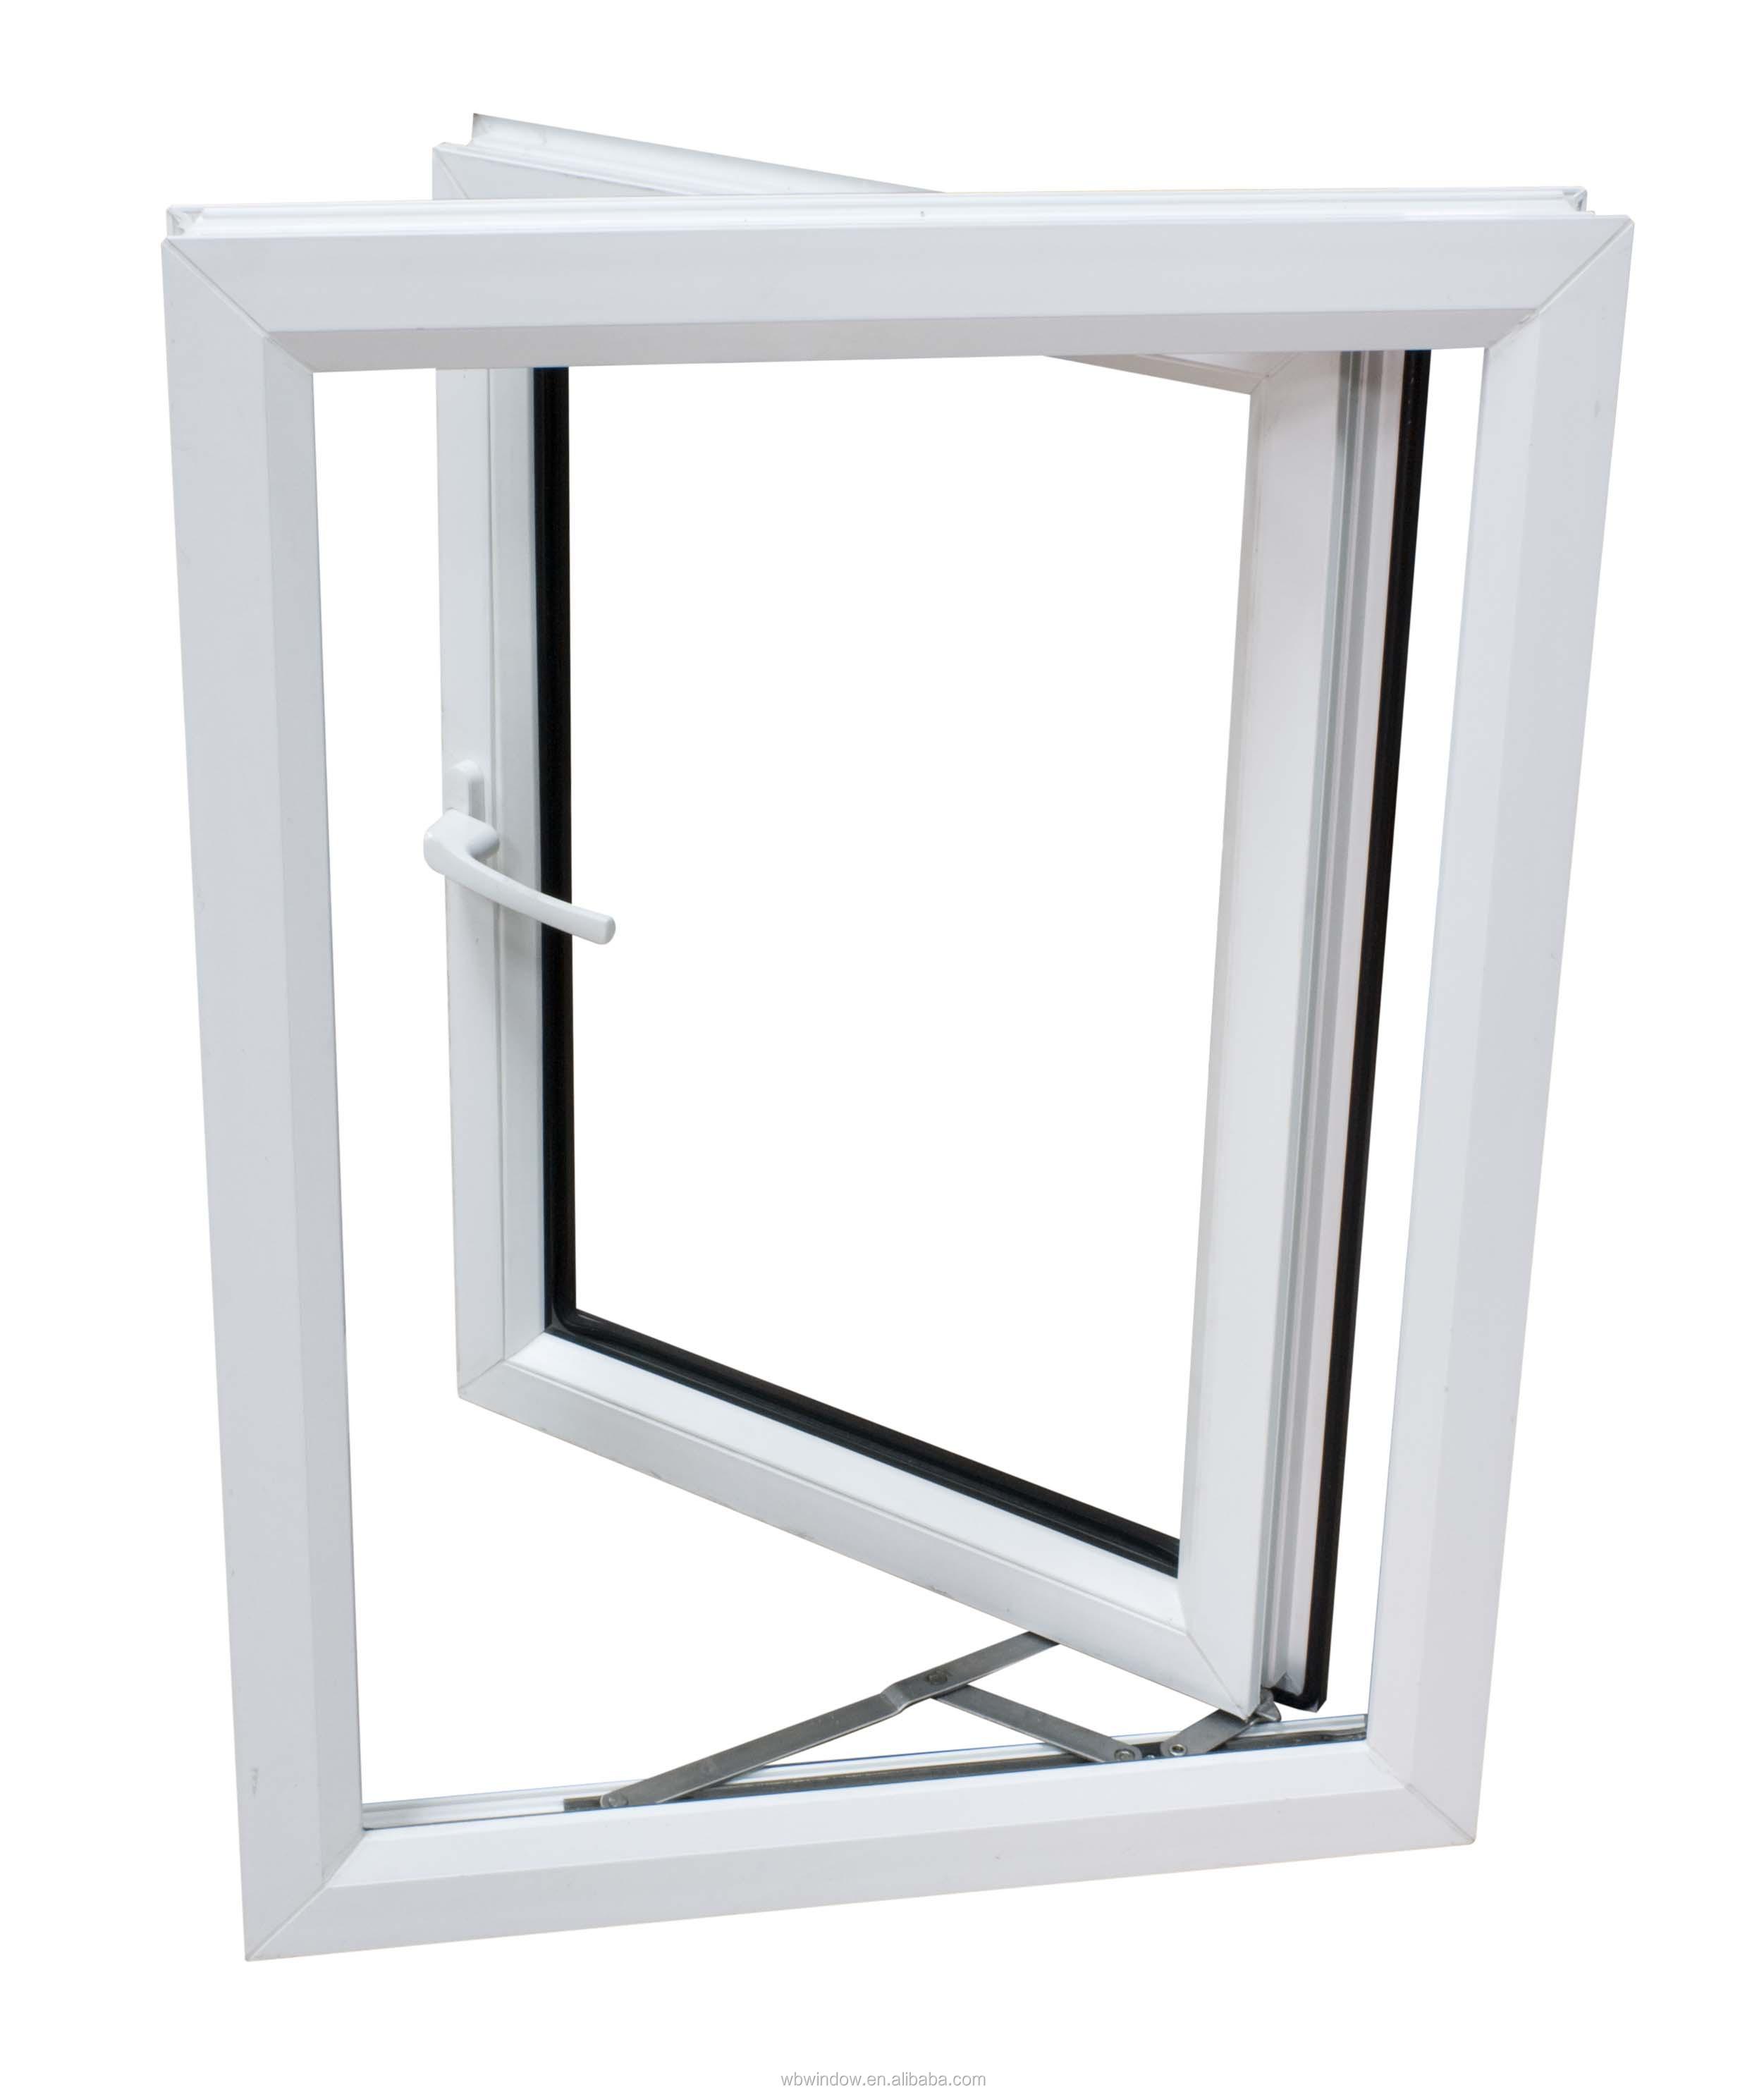 Pvc Window Product : Uv anti lg pvc casement window plastic sash